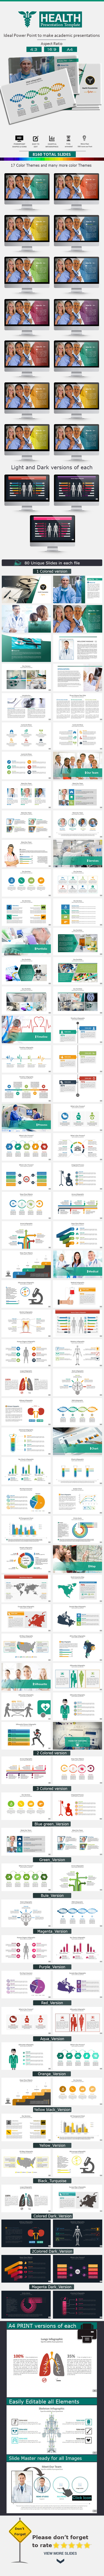 Health Presentation Template - Miscellaneous PowerPoint Templates